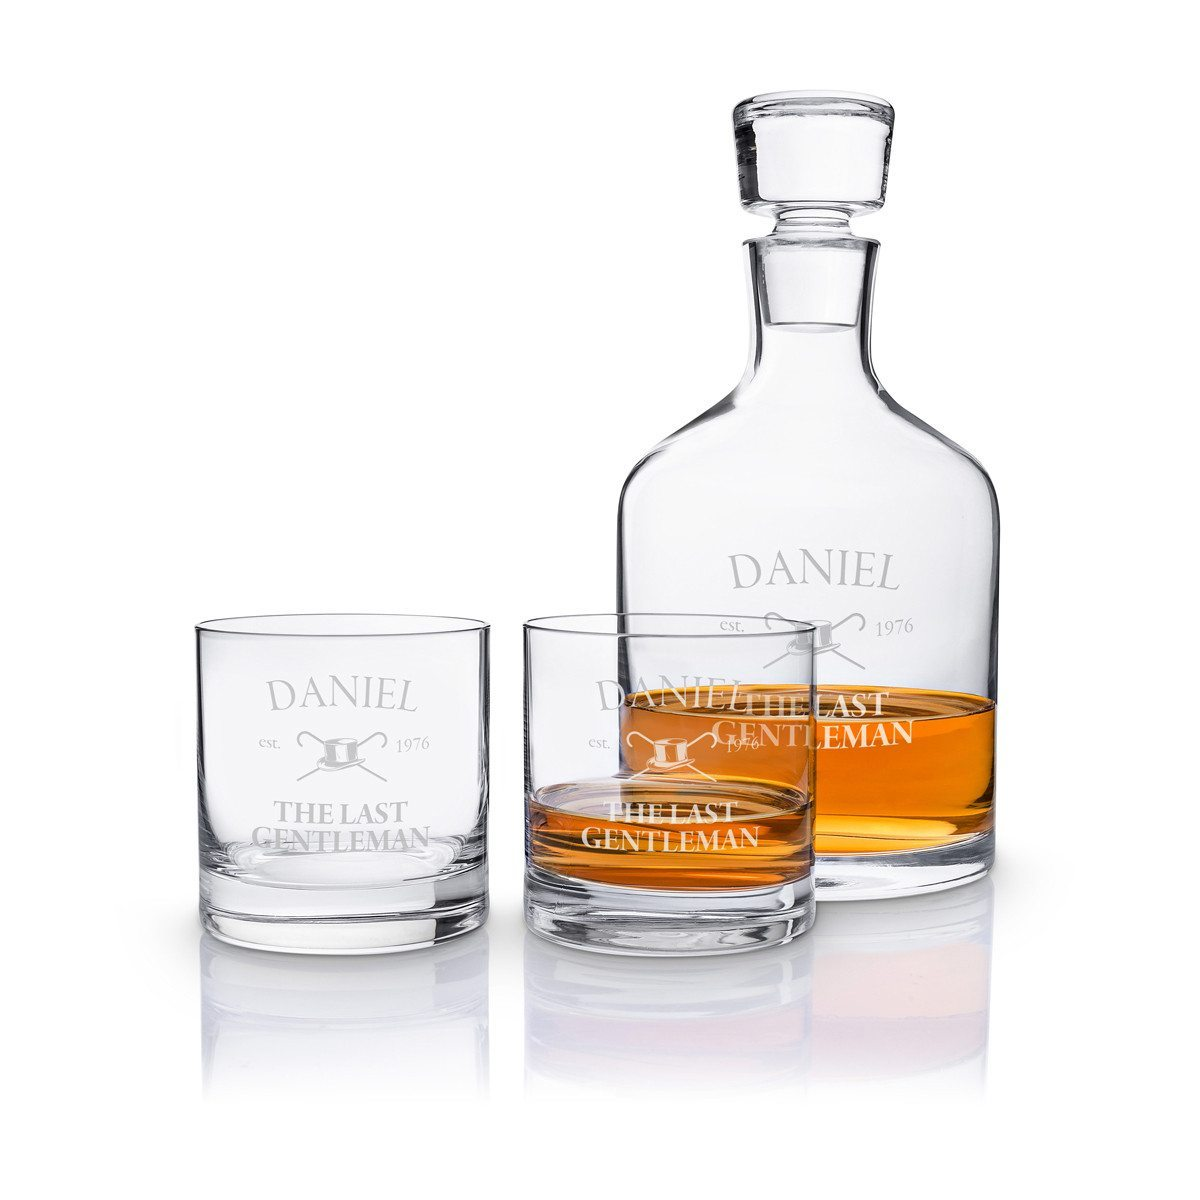 Leonardo - whiskysæt med indgravering